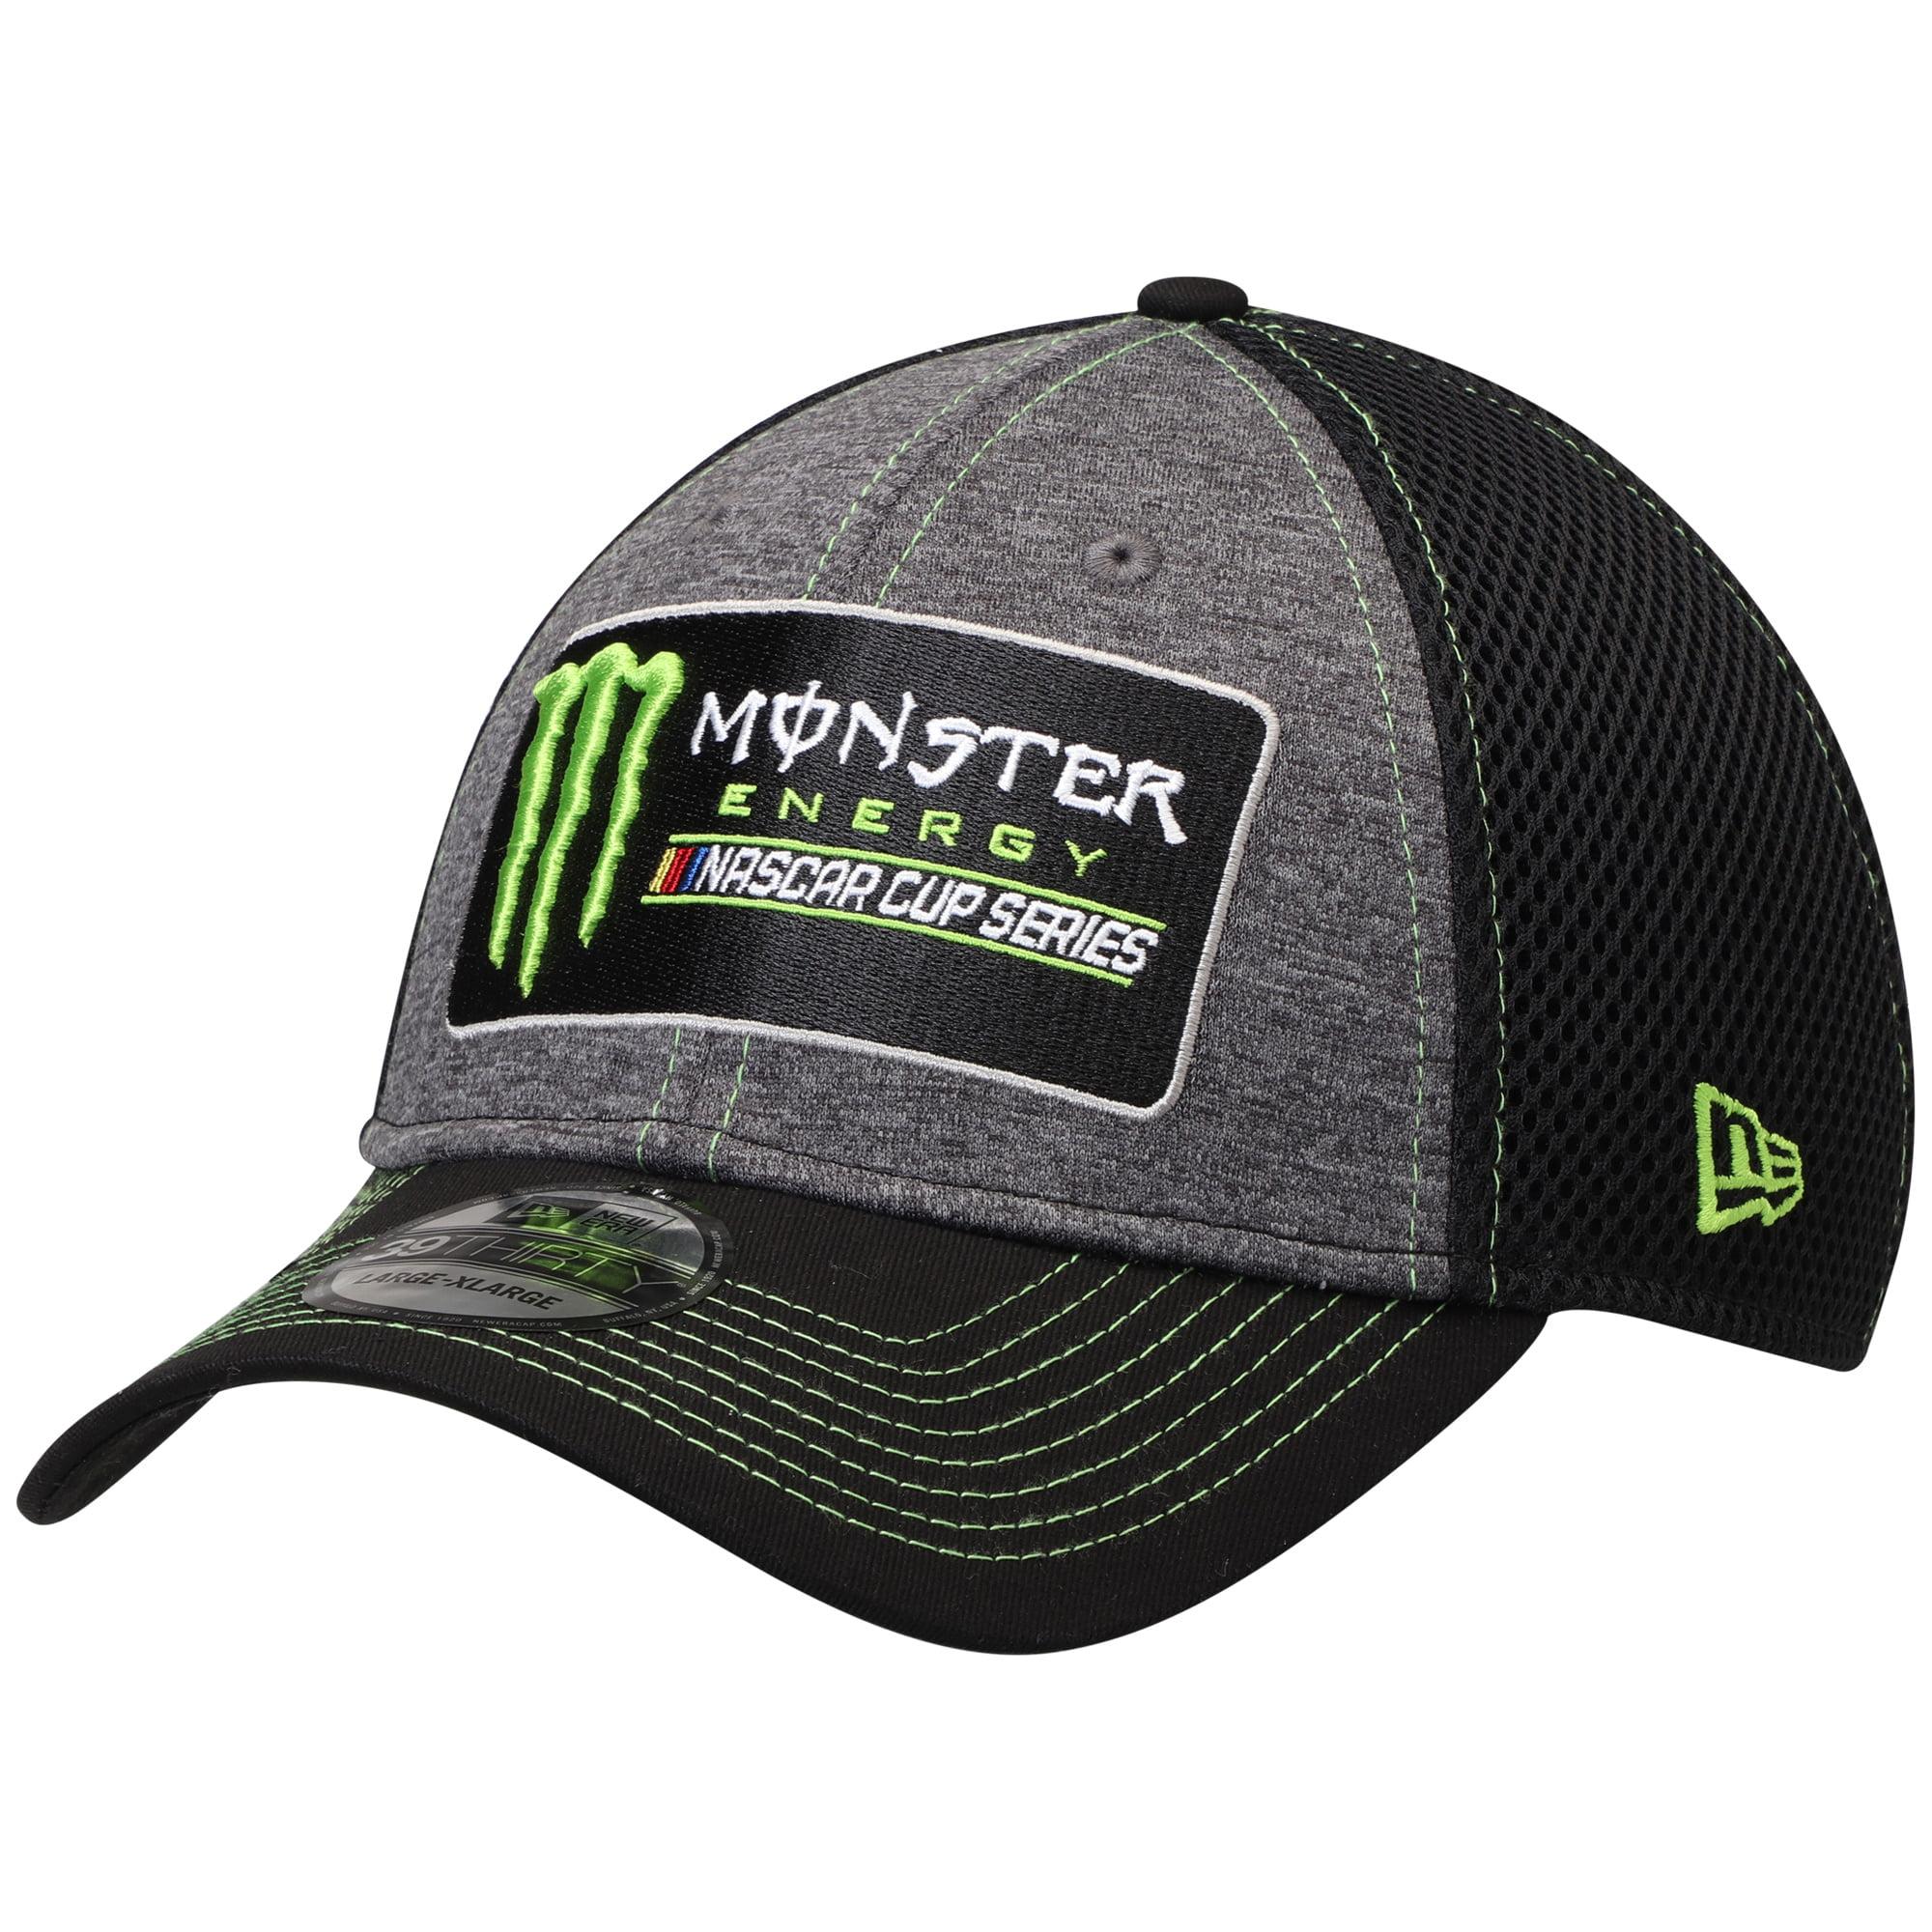 NASCAR New Era Monster Energy Black Neo Sponsor 39THIRTY Flex Hat - Graphite/Black